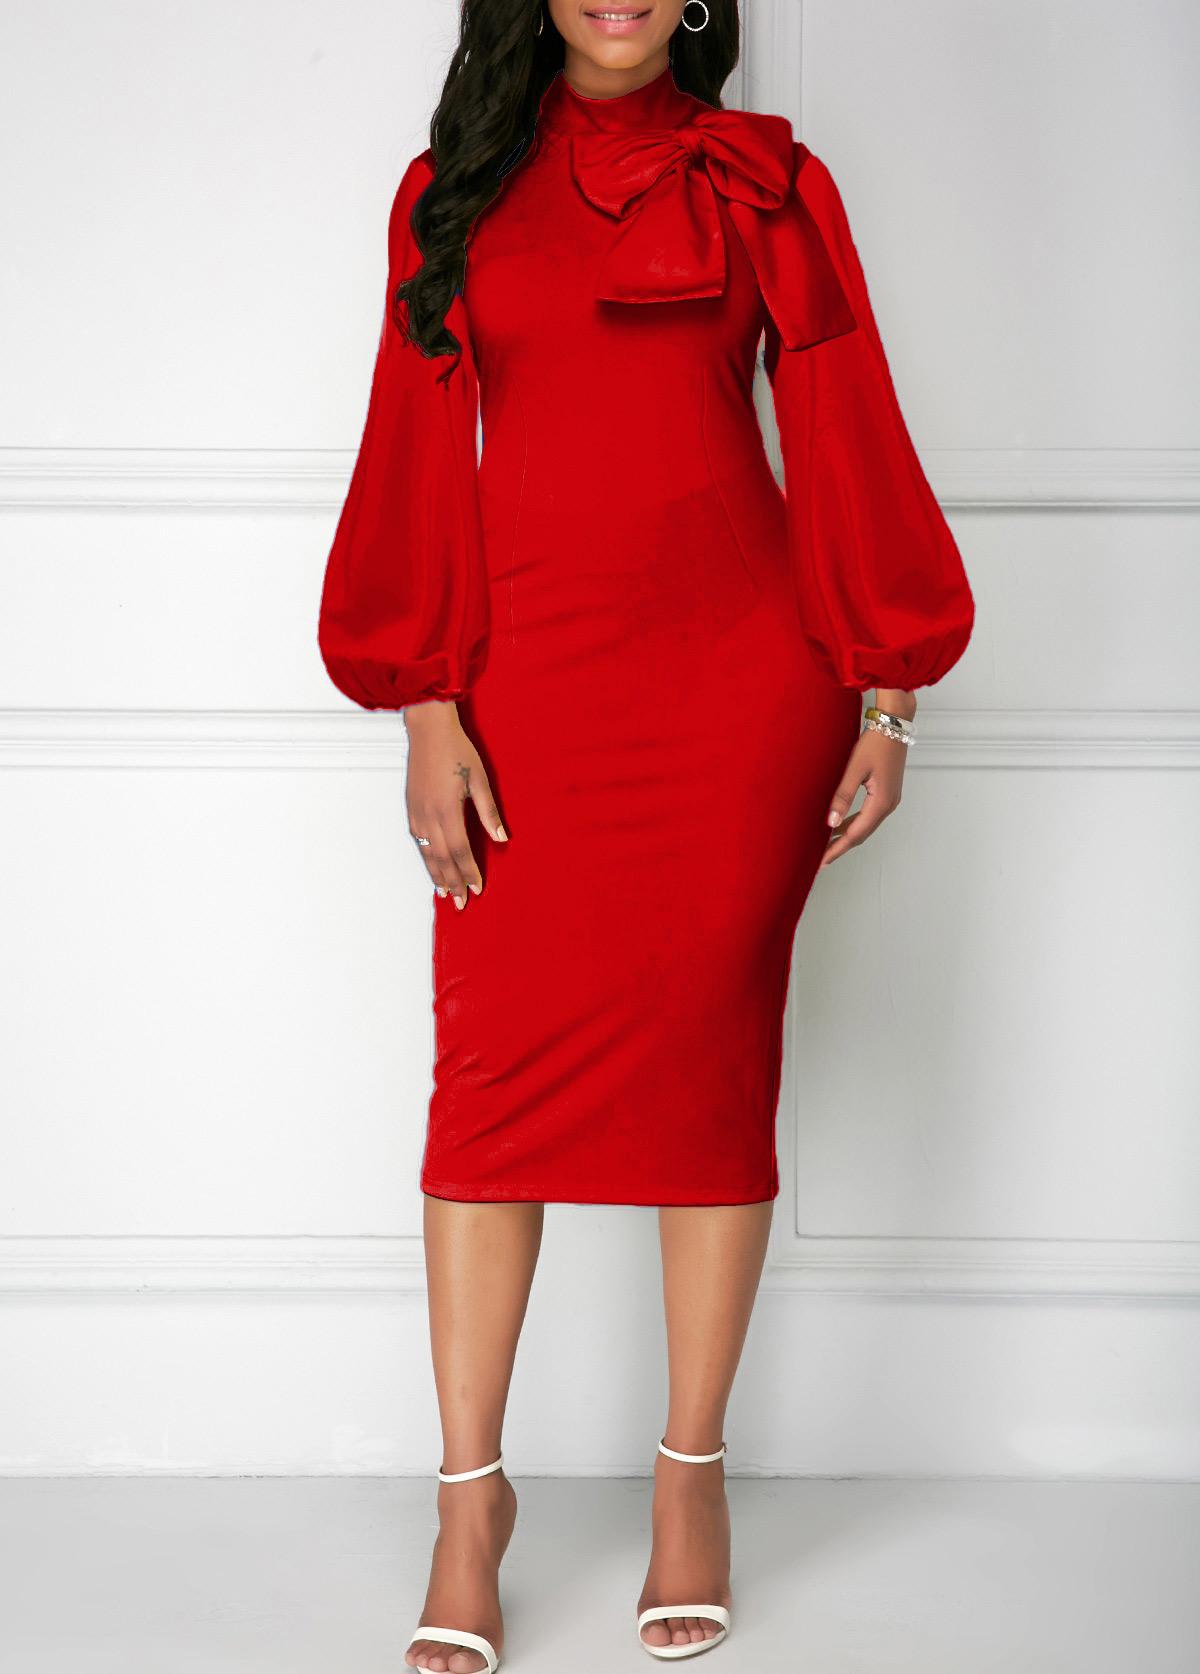 Red Bowknot Neck Lantern Sleeve Sheath Dress